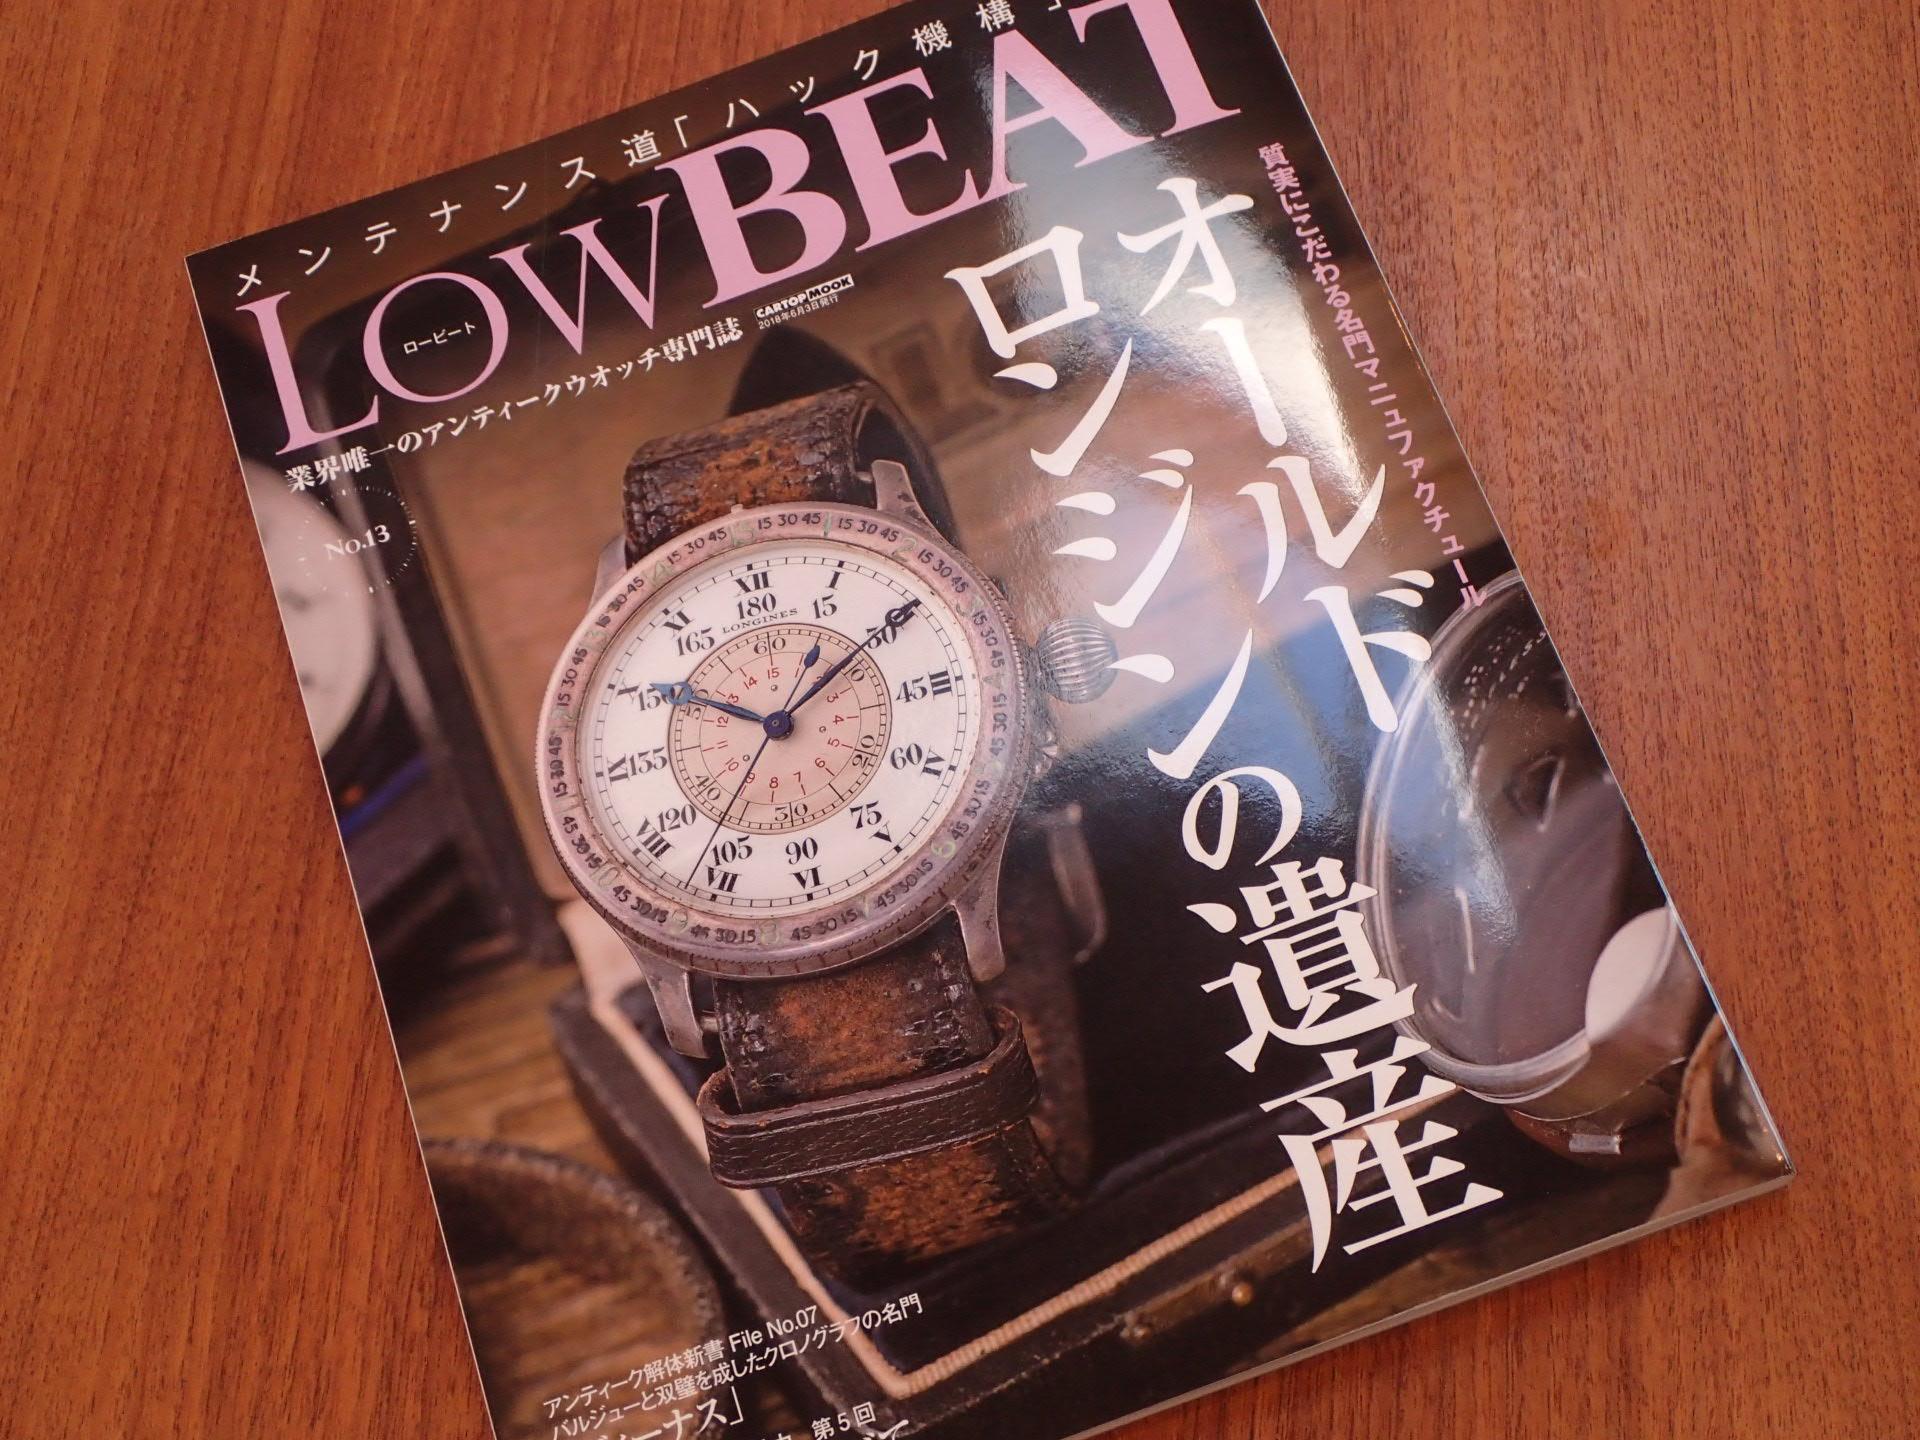 LowBEAT(ロービート)No.13 発売 第5回ミリタリー特集(旧日本軍・自衛隊)